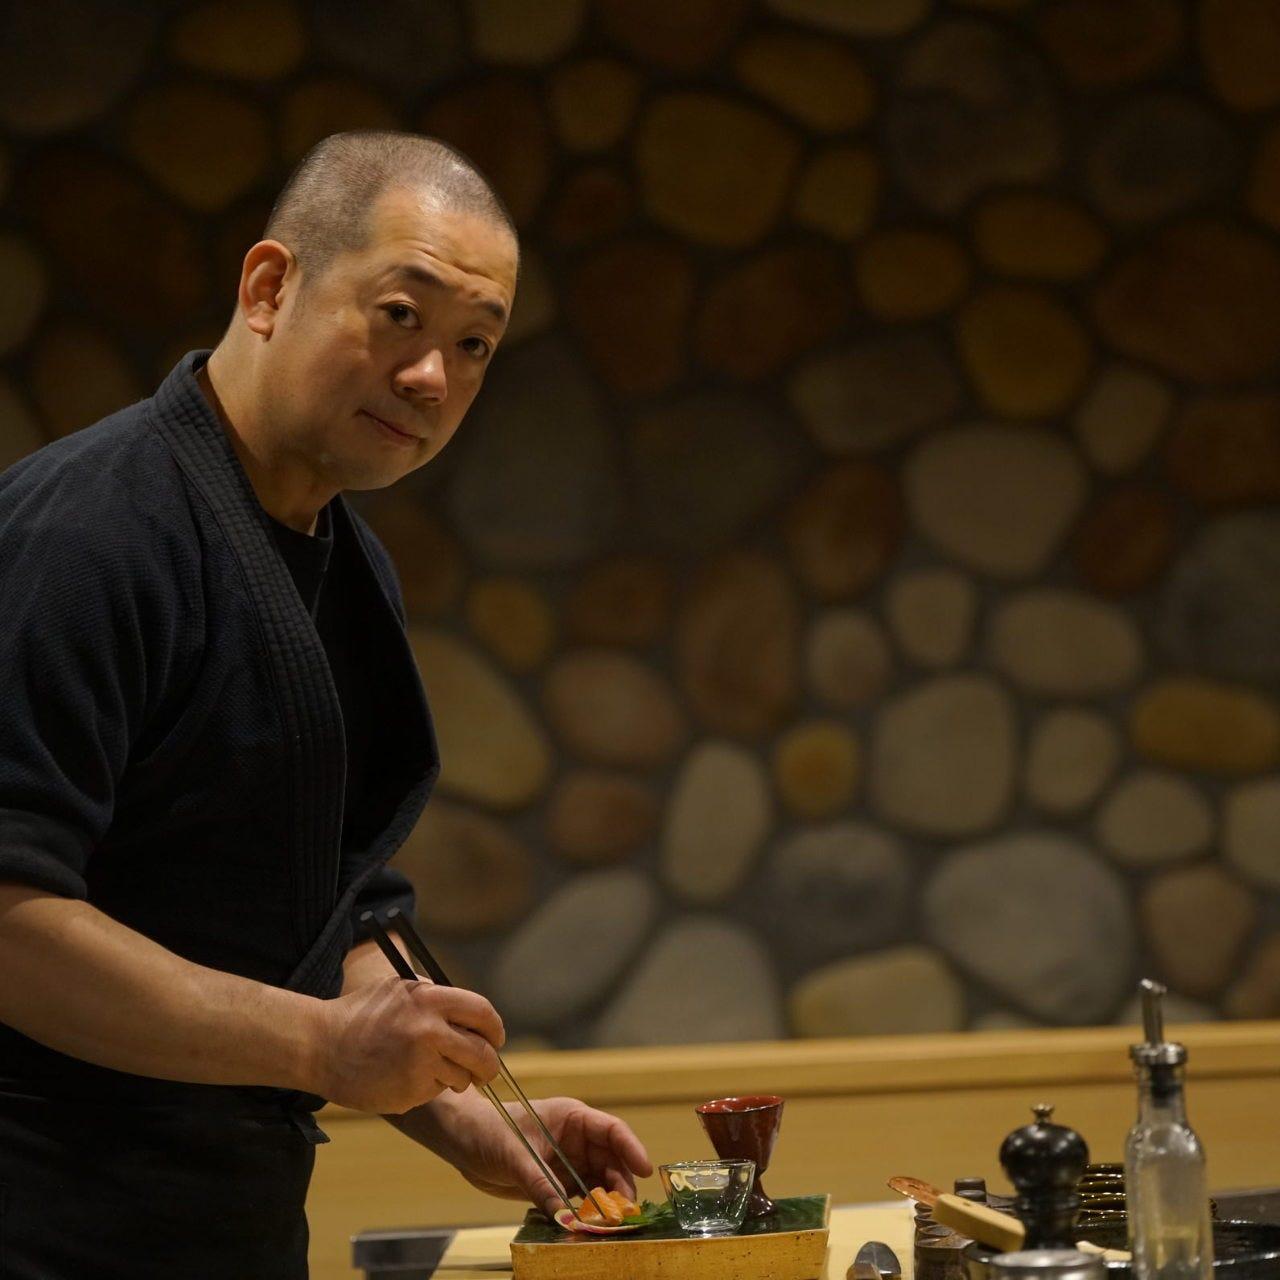 chef小菅和樹のご紹介